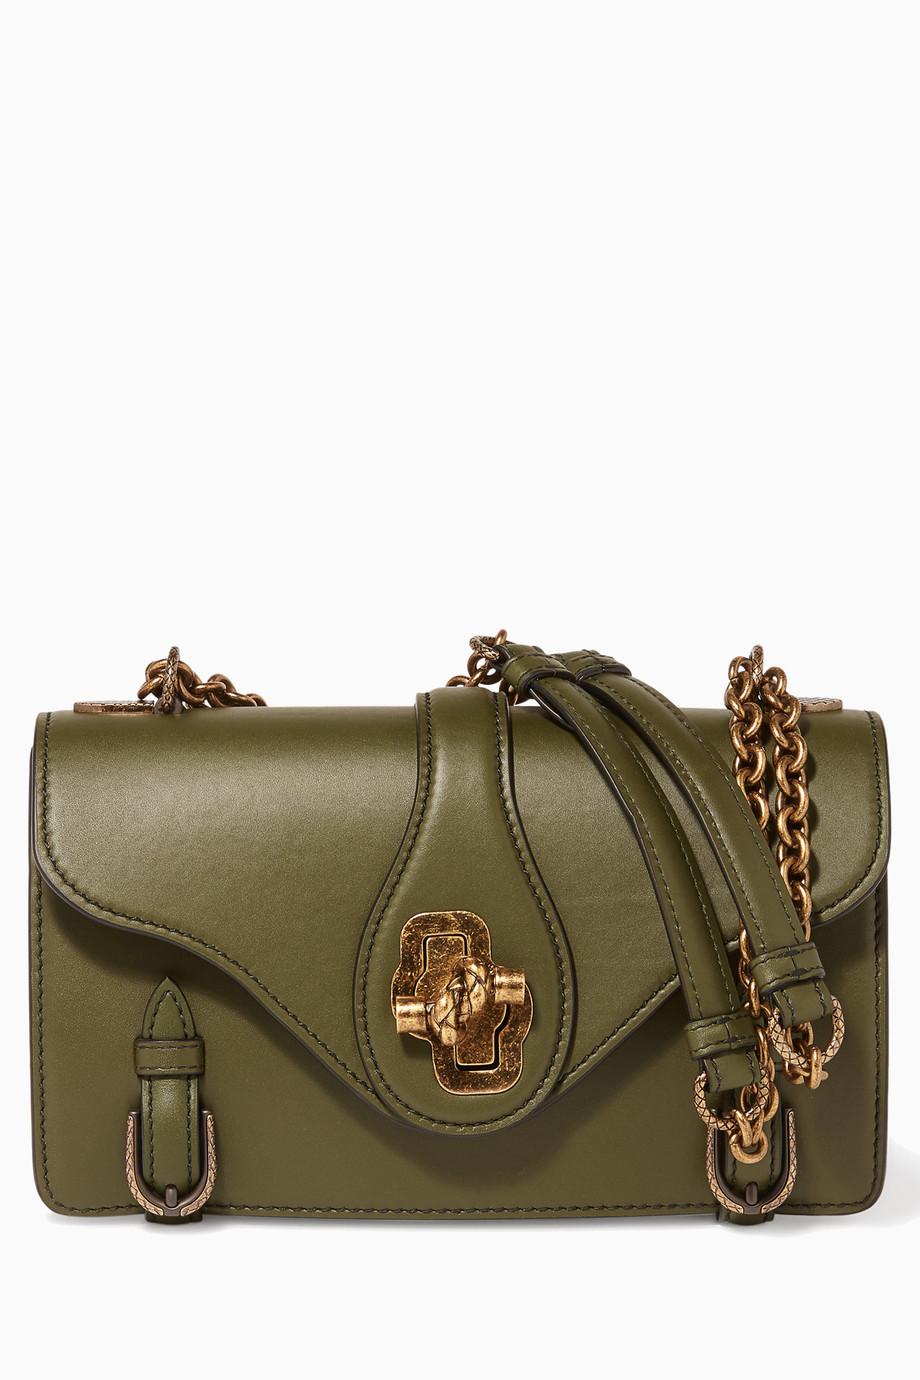 4d570e6290 Shop Bottega Veneta Green Dark-green City Knot Shoulder Bag for Women